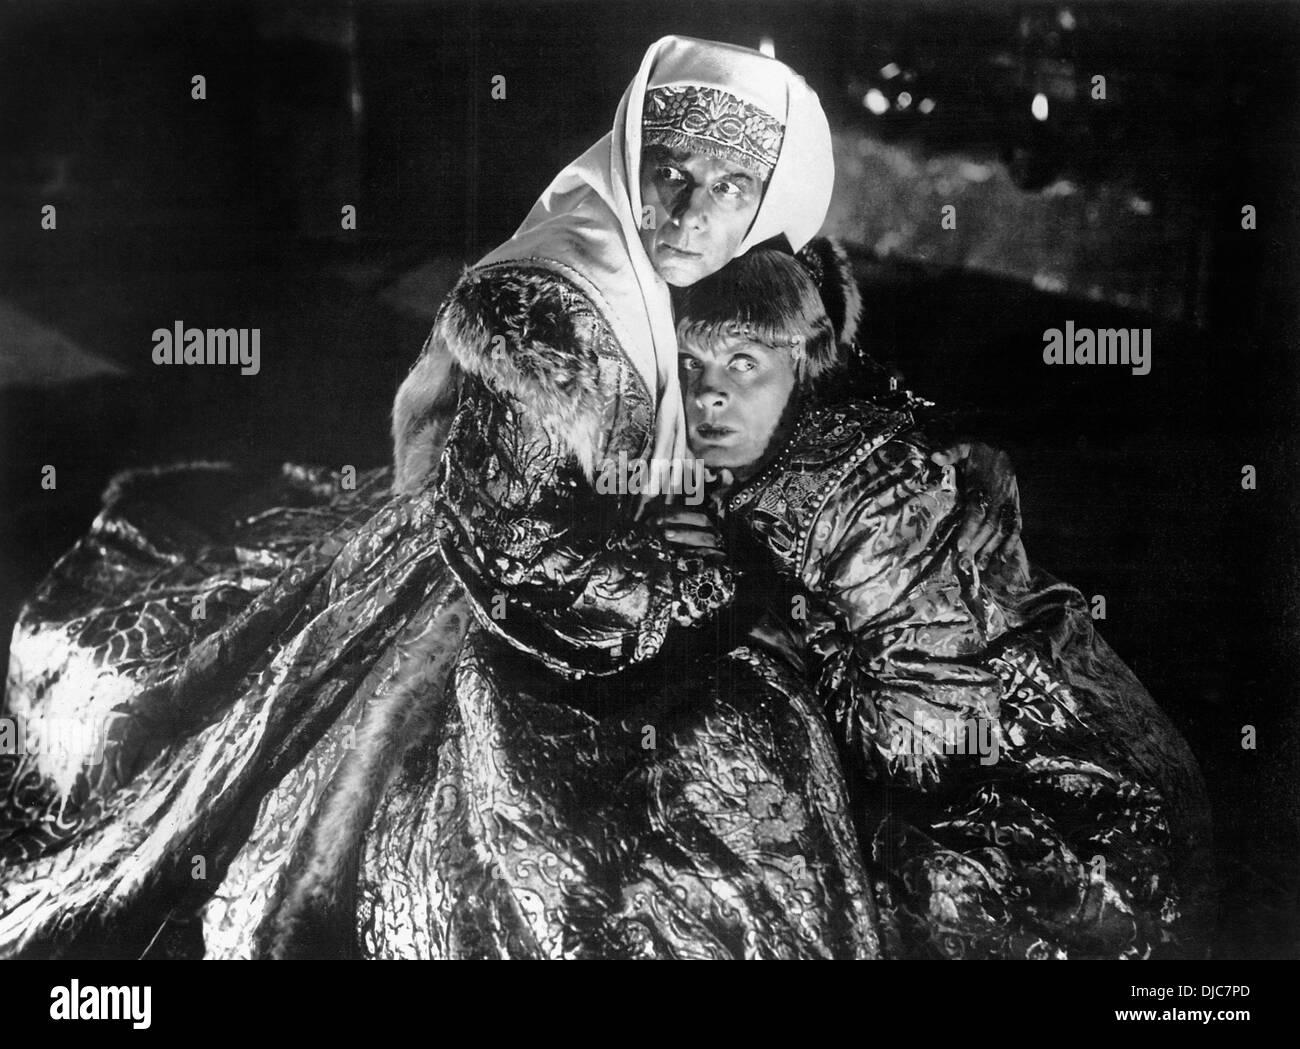 Lyudmila Tselikovskaya and Nikolai Cherkassov on-set of the Film, Ivan the Terrible Part II (aka Ivan Groznyy II), 1945 - Stock Image